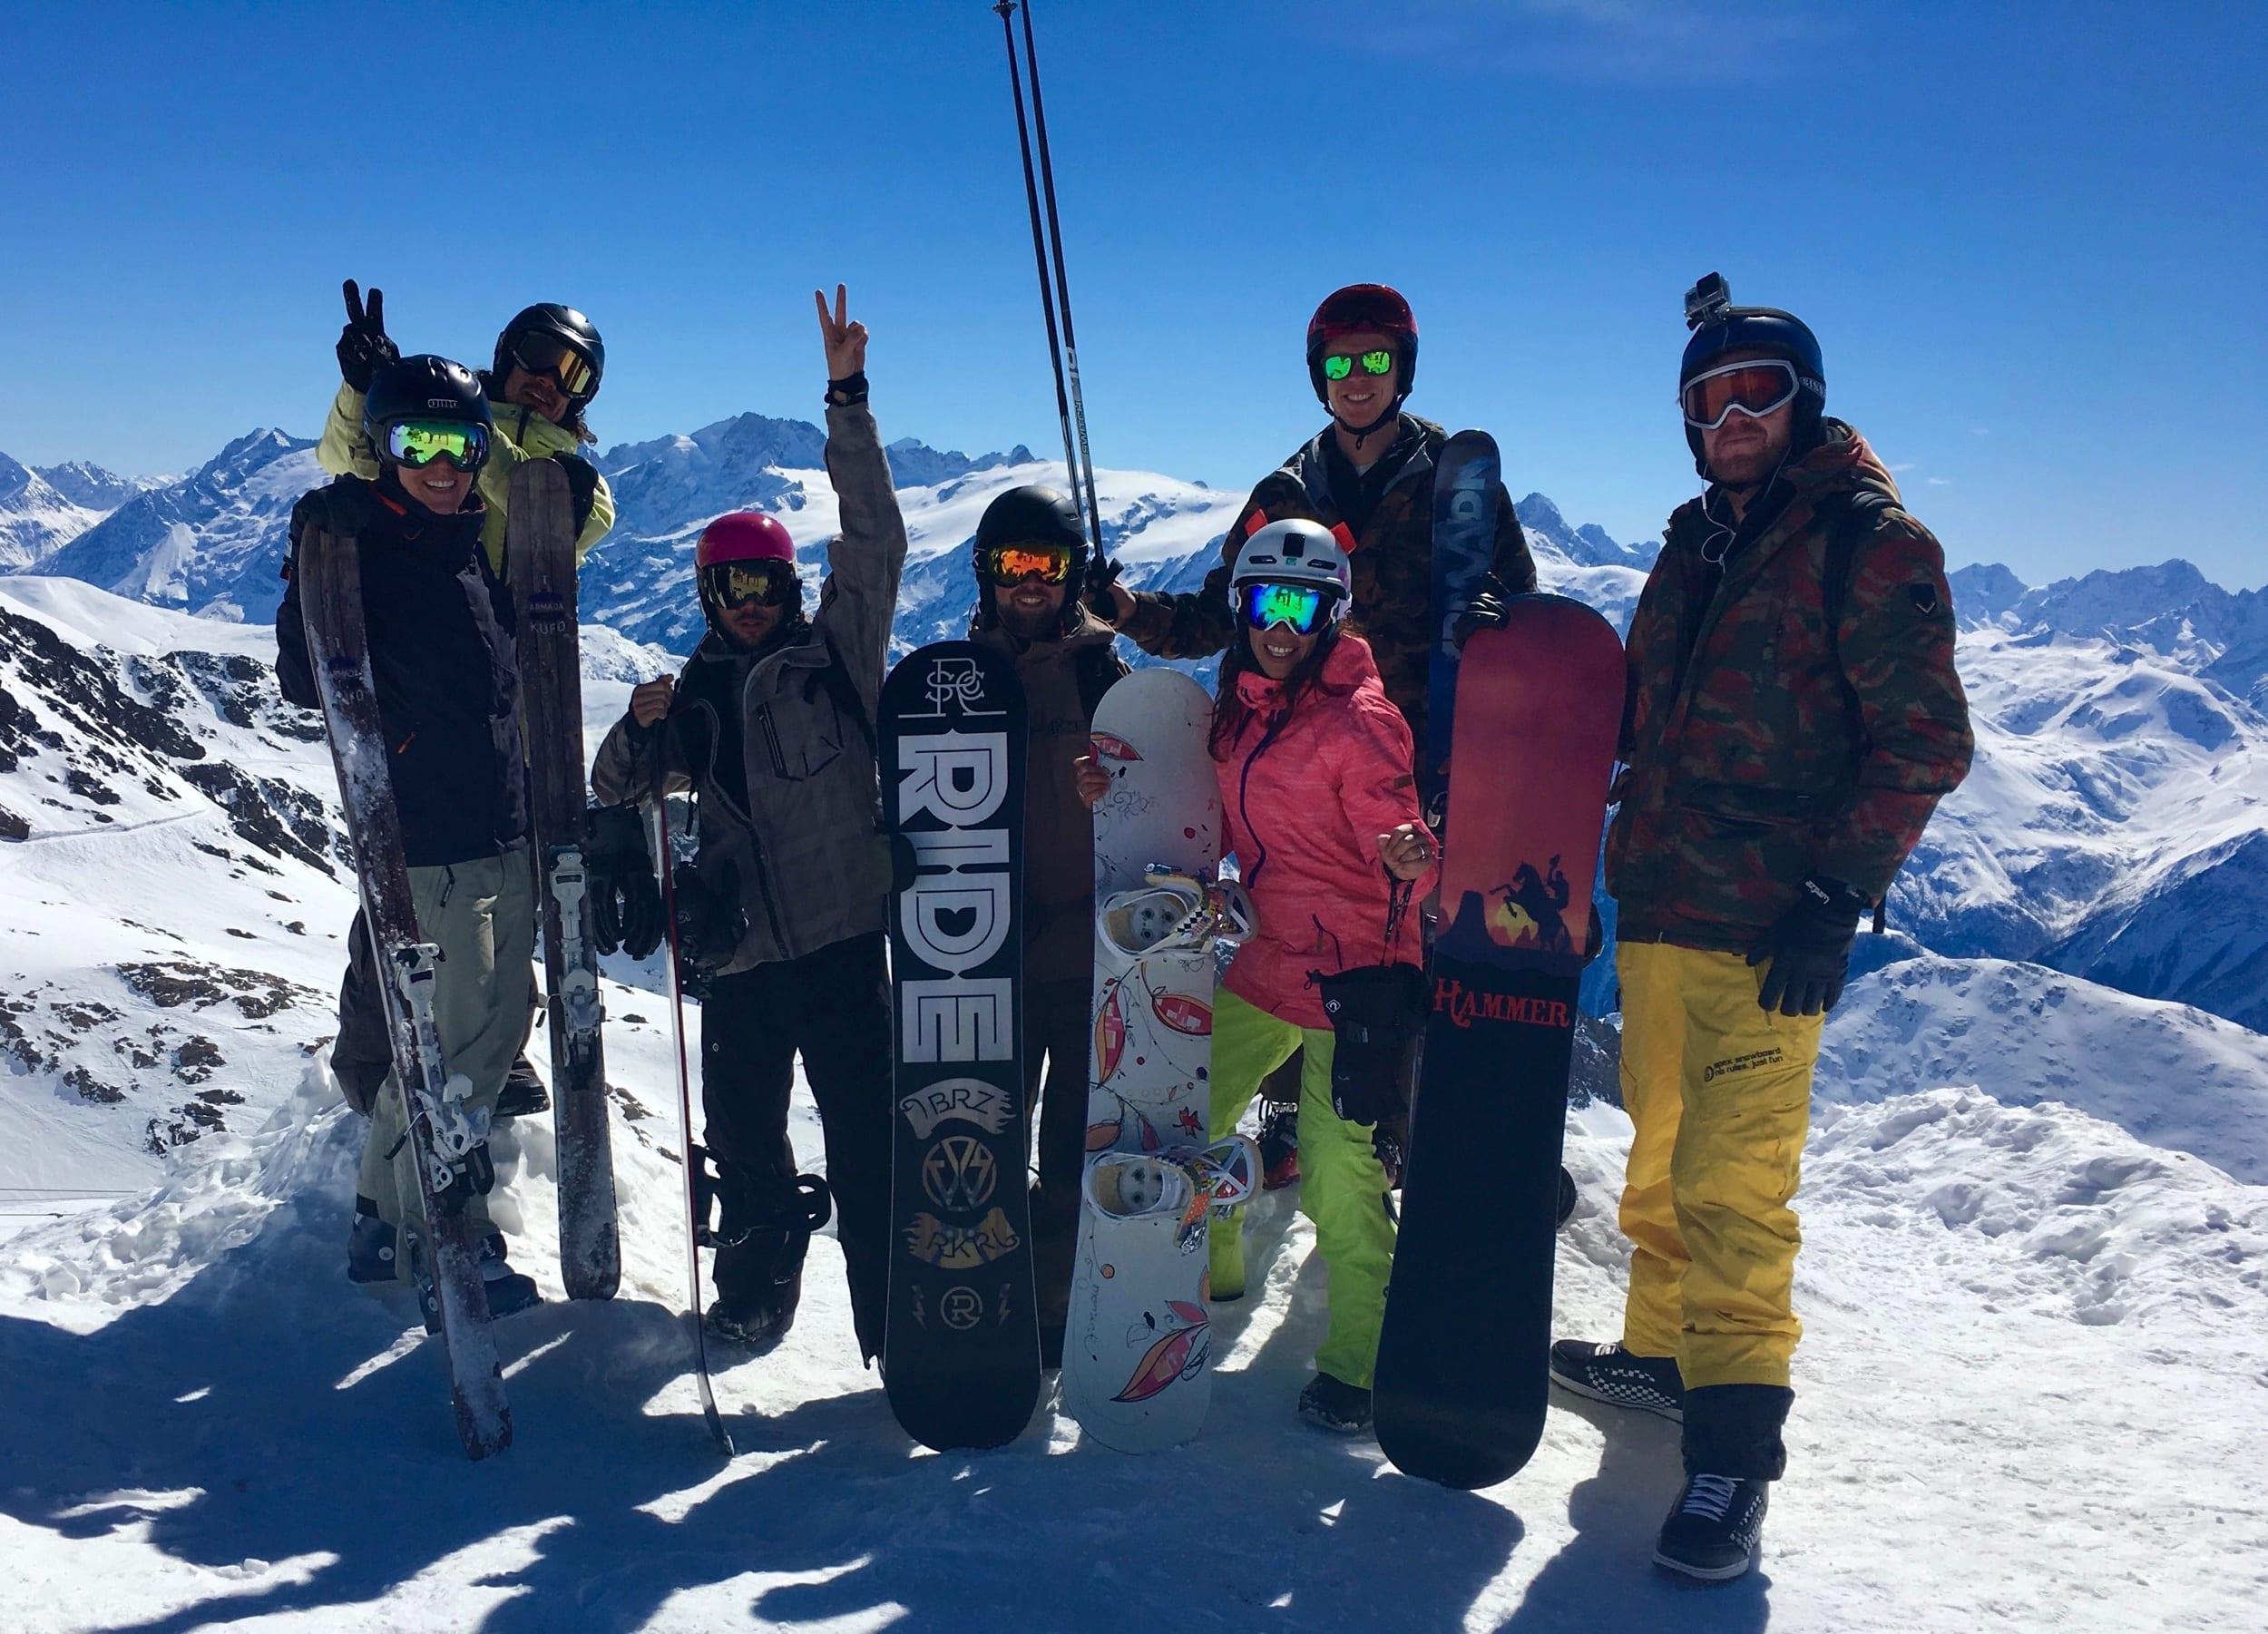 Wintersport chalet Frankrijk - 1 (2)